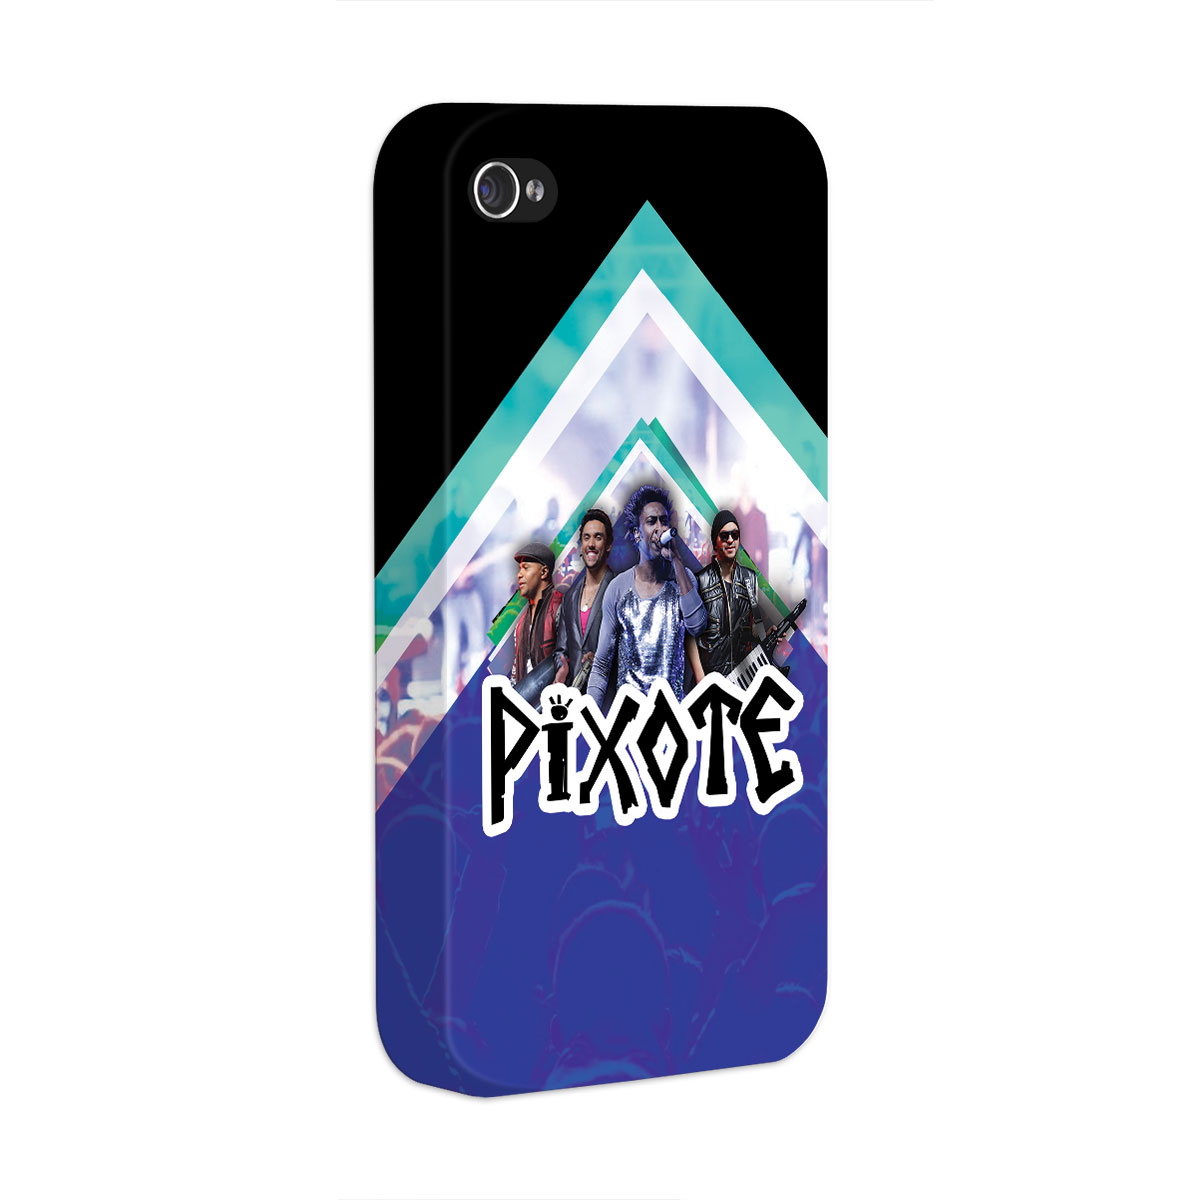 Capa para iPhone 4/4S Pixote Foto